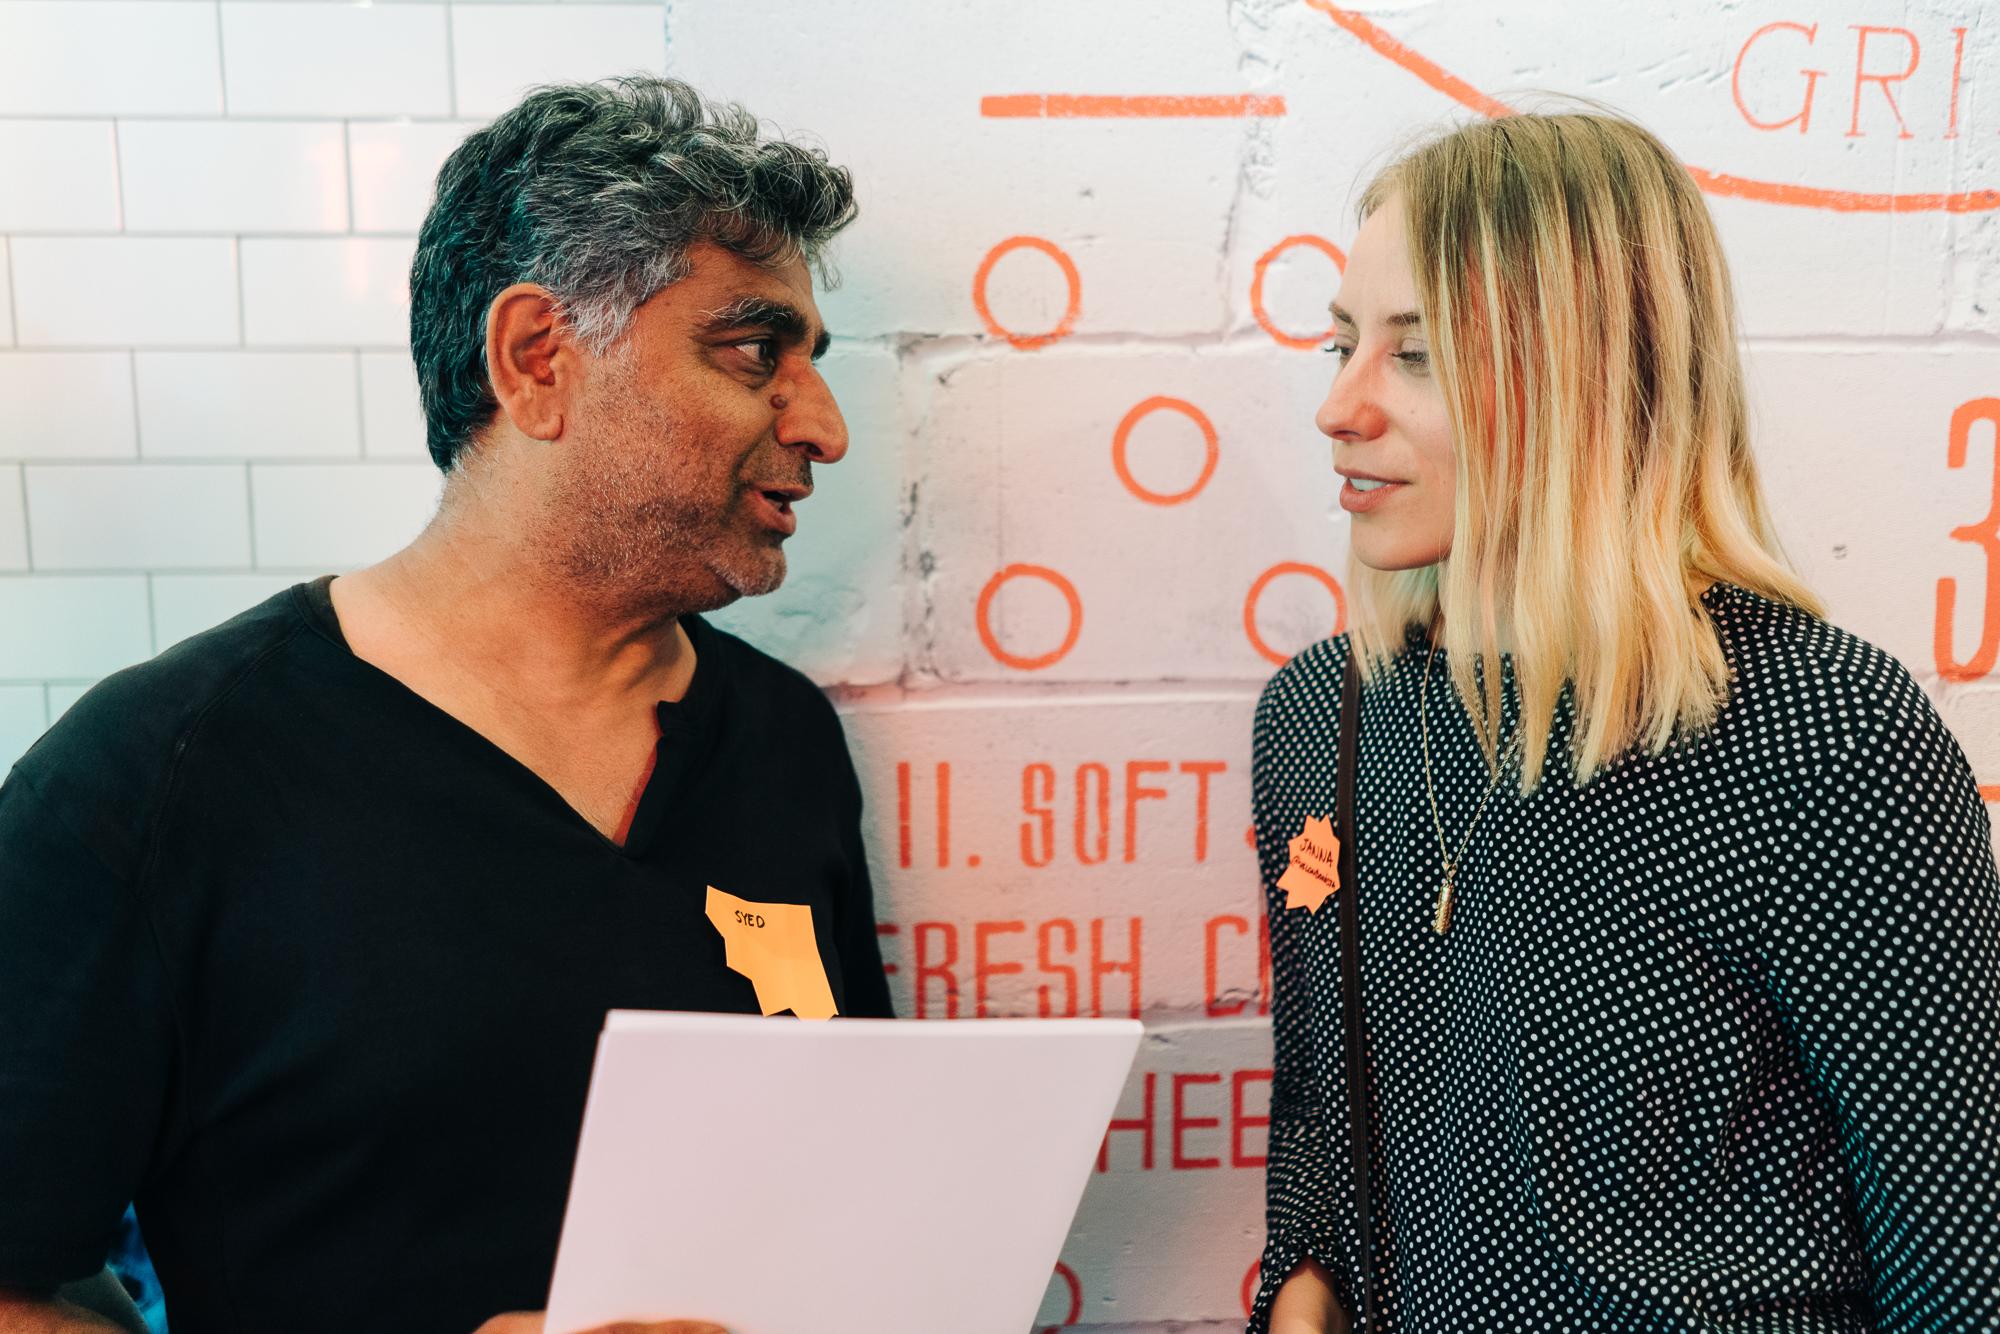 Digital mentors and local businesses at POW Digital Camp meetup in Whitechapel